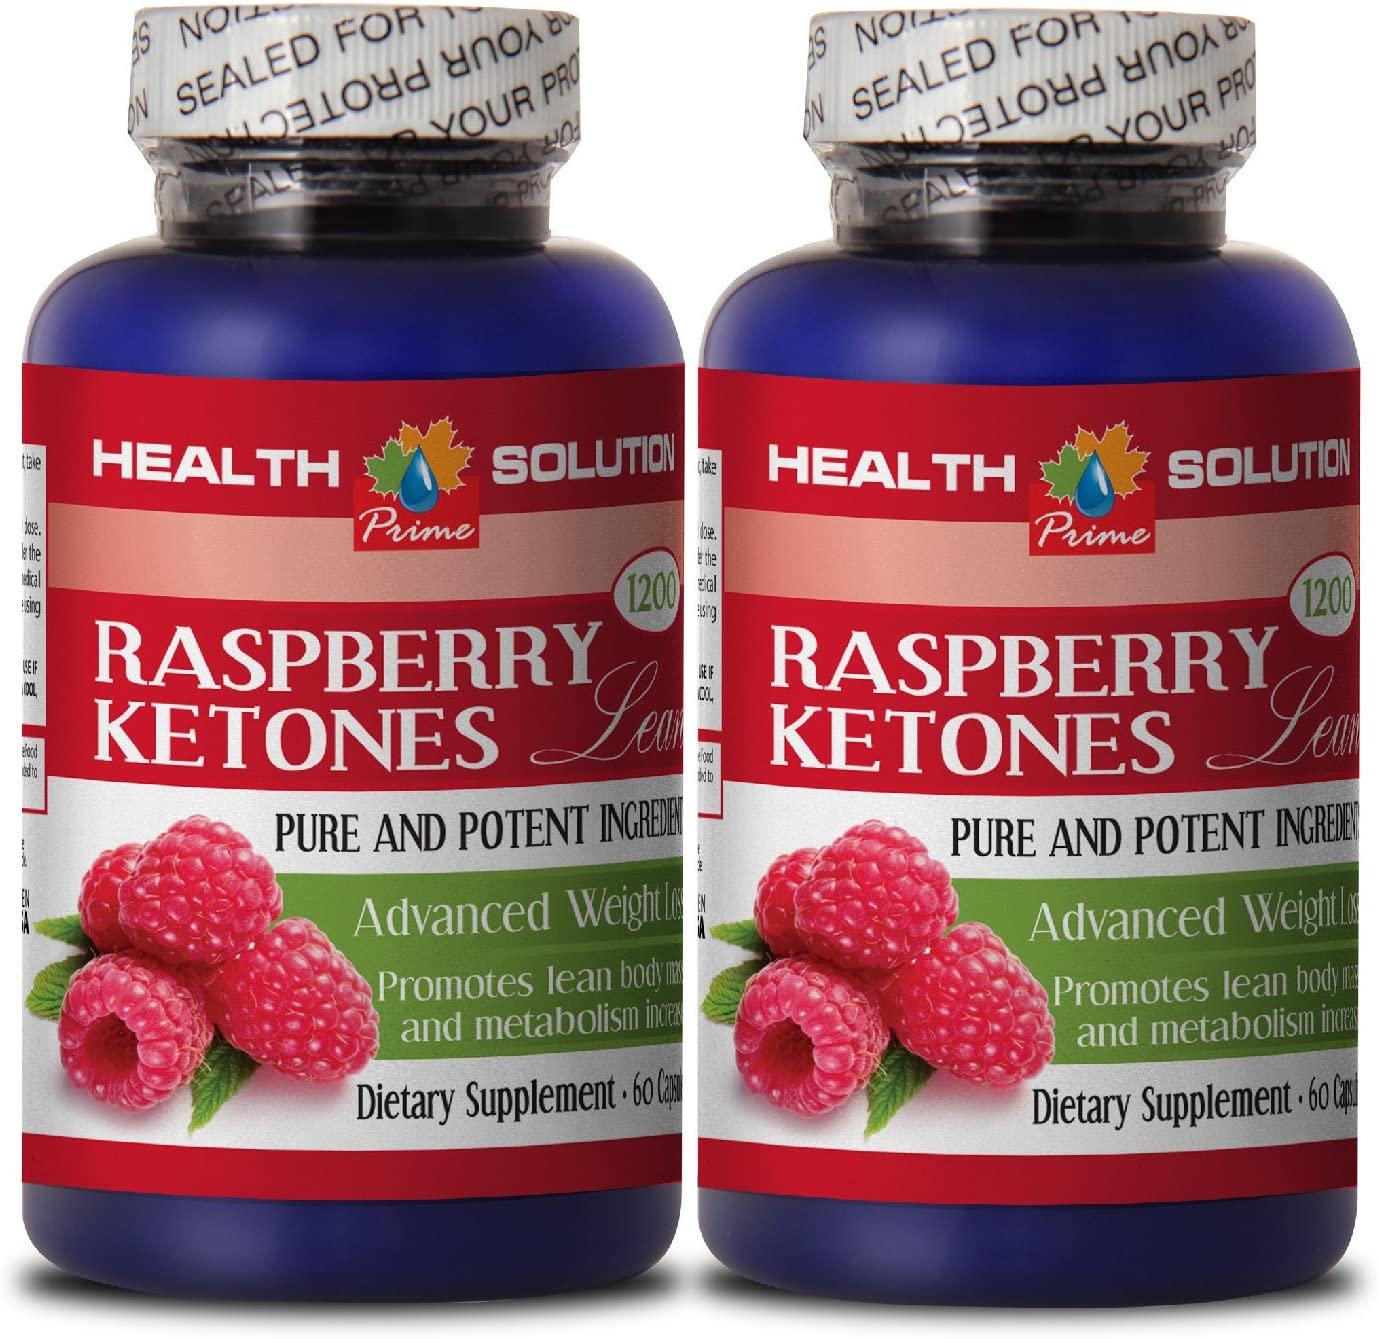 Fat Burner Pills for Belly Fat - Raspberry Ketones Lean (Advanced Formula) 1200mg - African Mango and Raspberry - 2 Bottles 120 Capsules